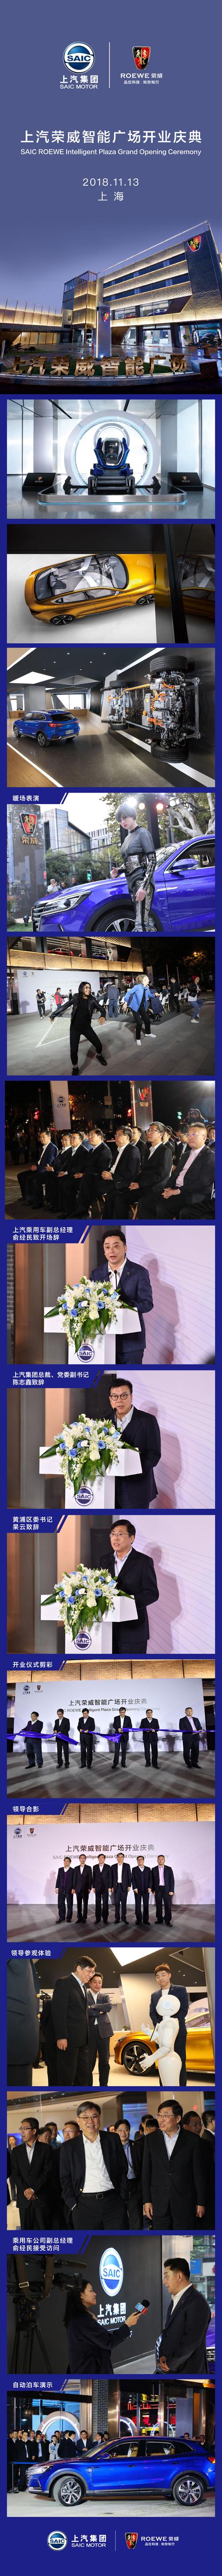 beplay下载app下载荣威智能广场开门迎客 汽车行业首个新零售体系落地成型